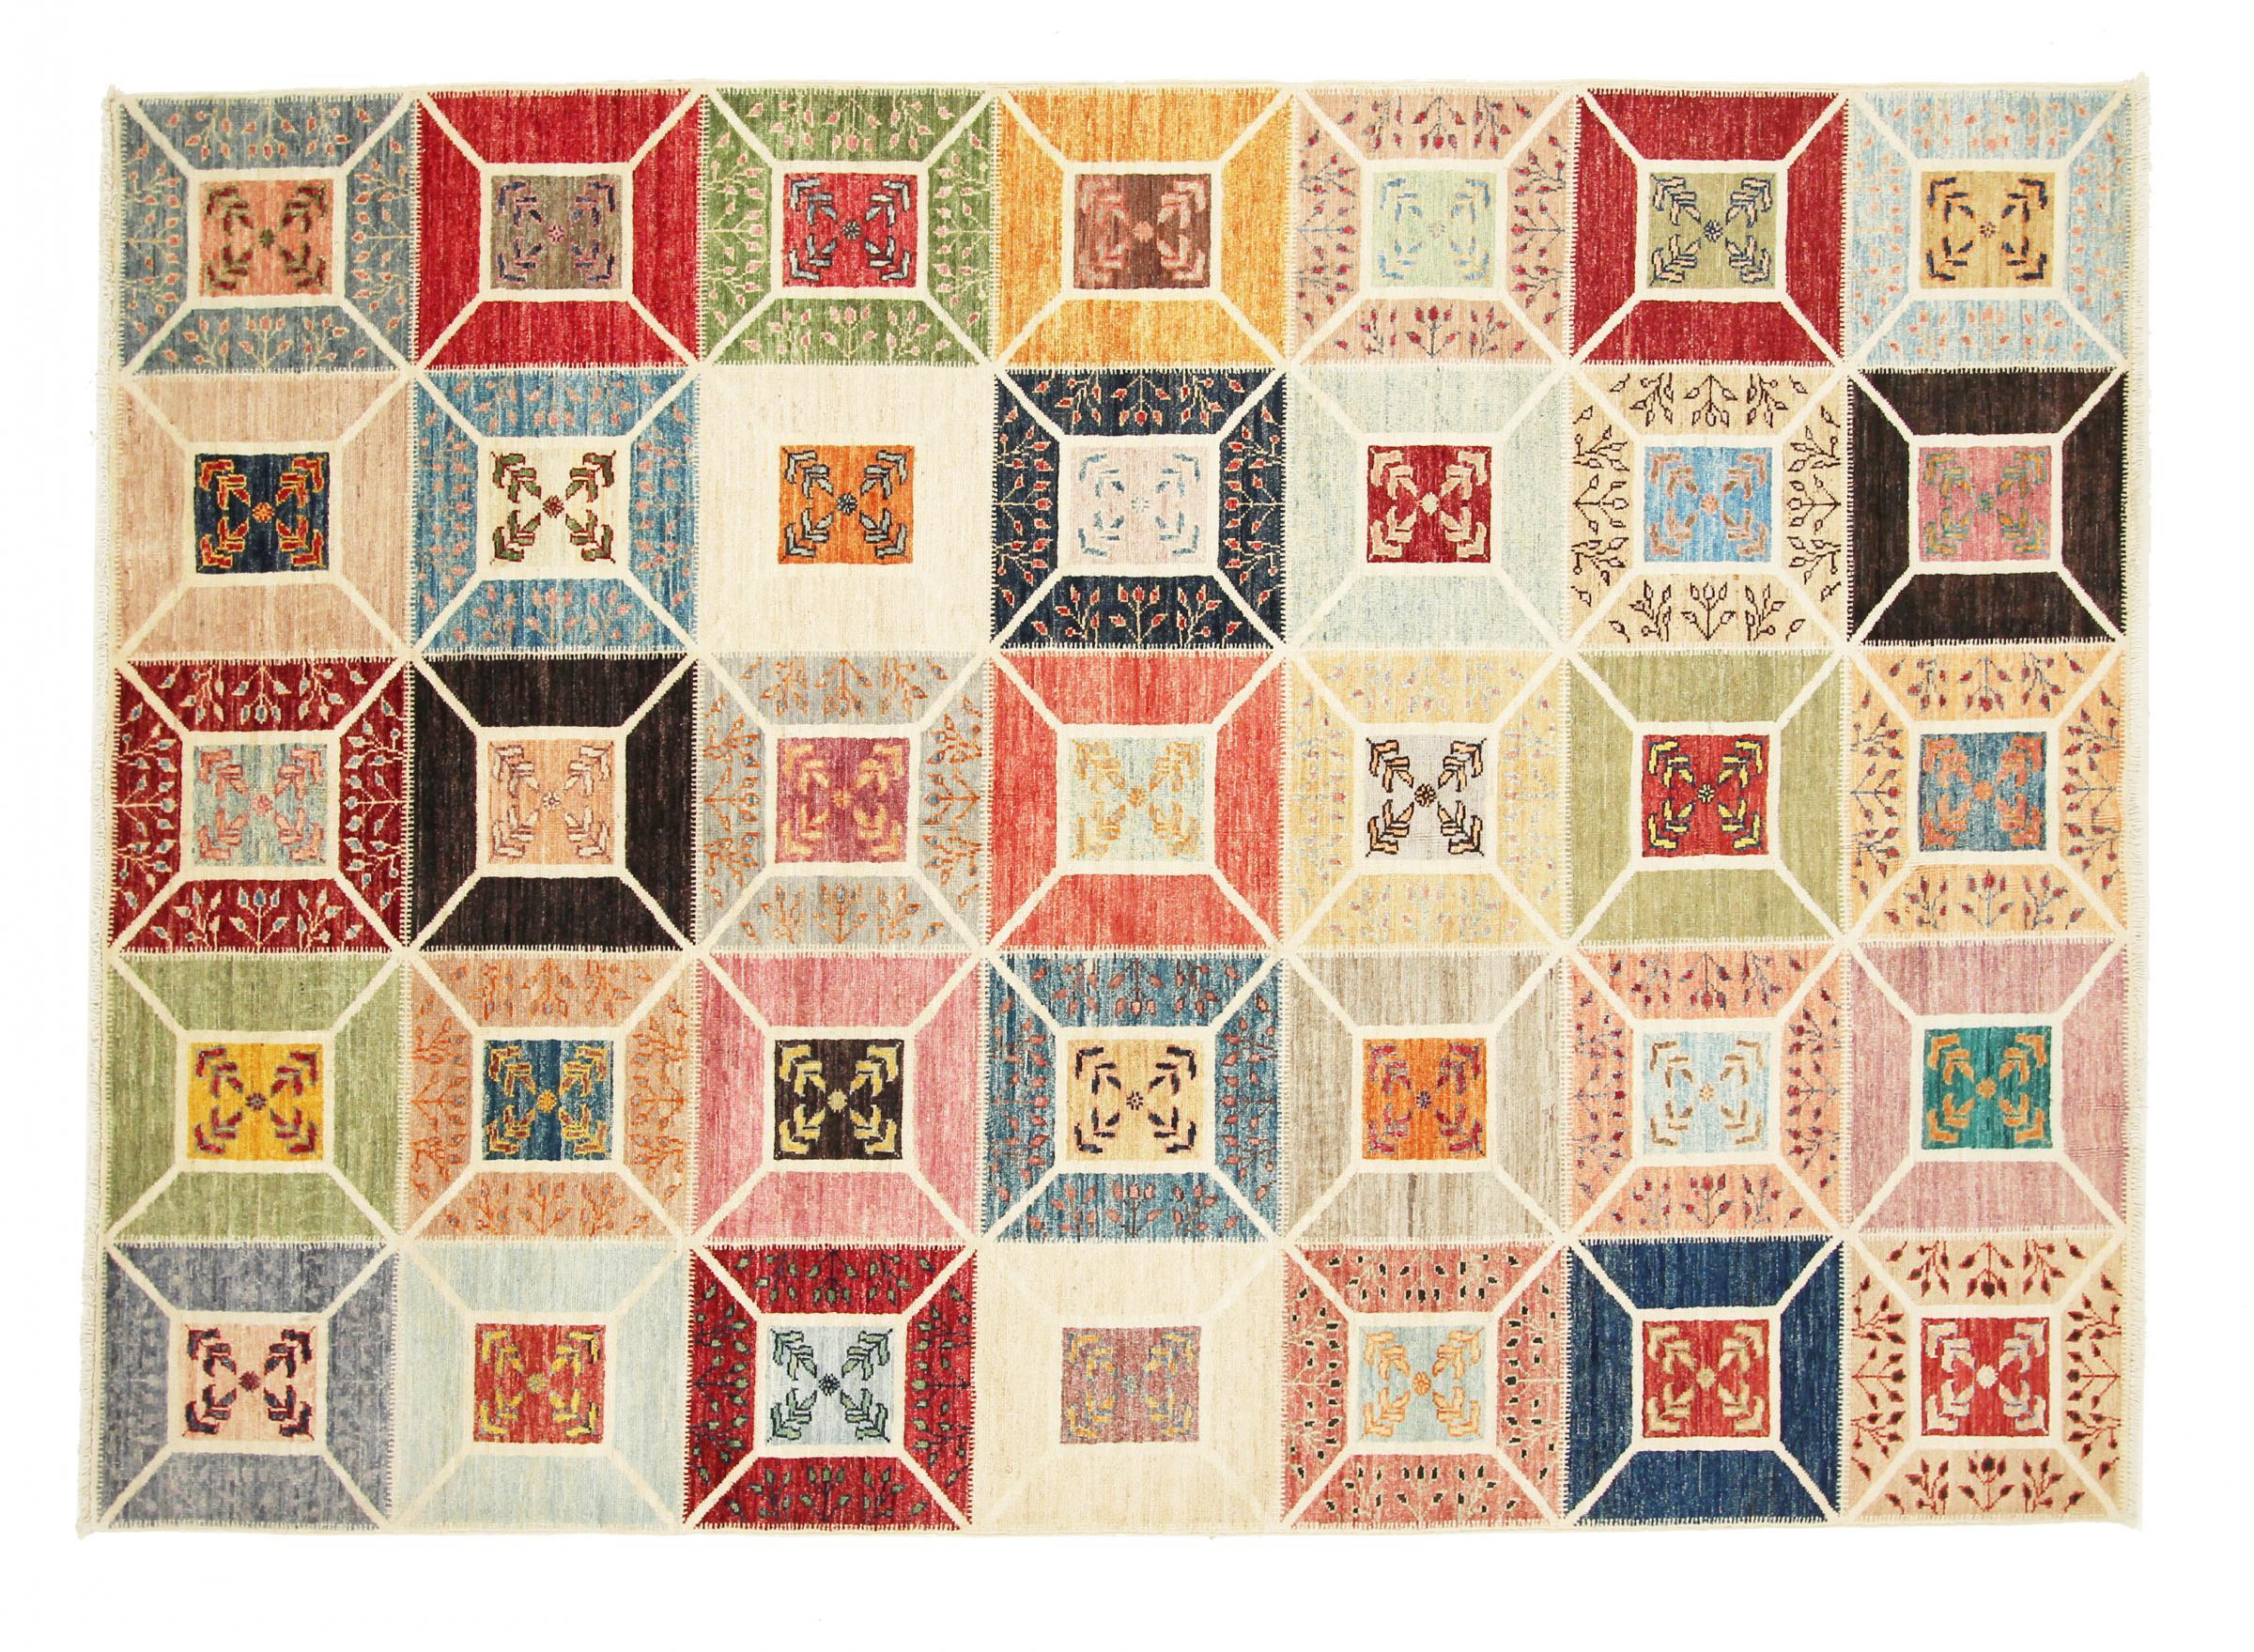 arijana puzzle pakistanischer teppich 234x168 id21471. Black Bedroom Furniture Sets. Home Design Ideas